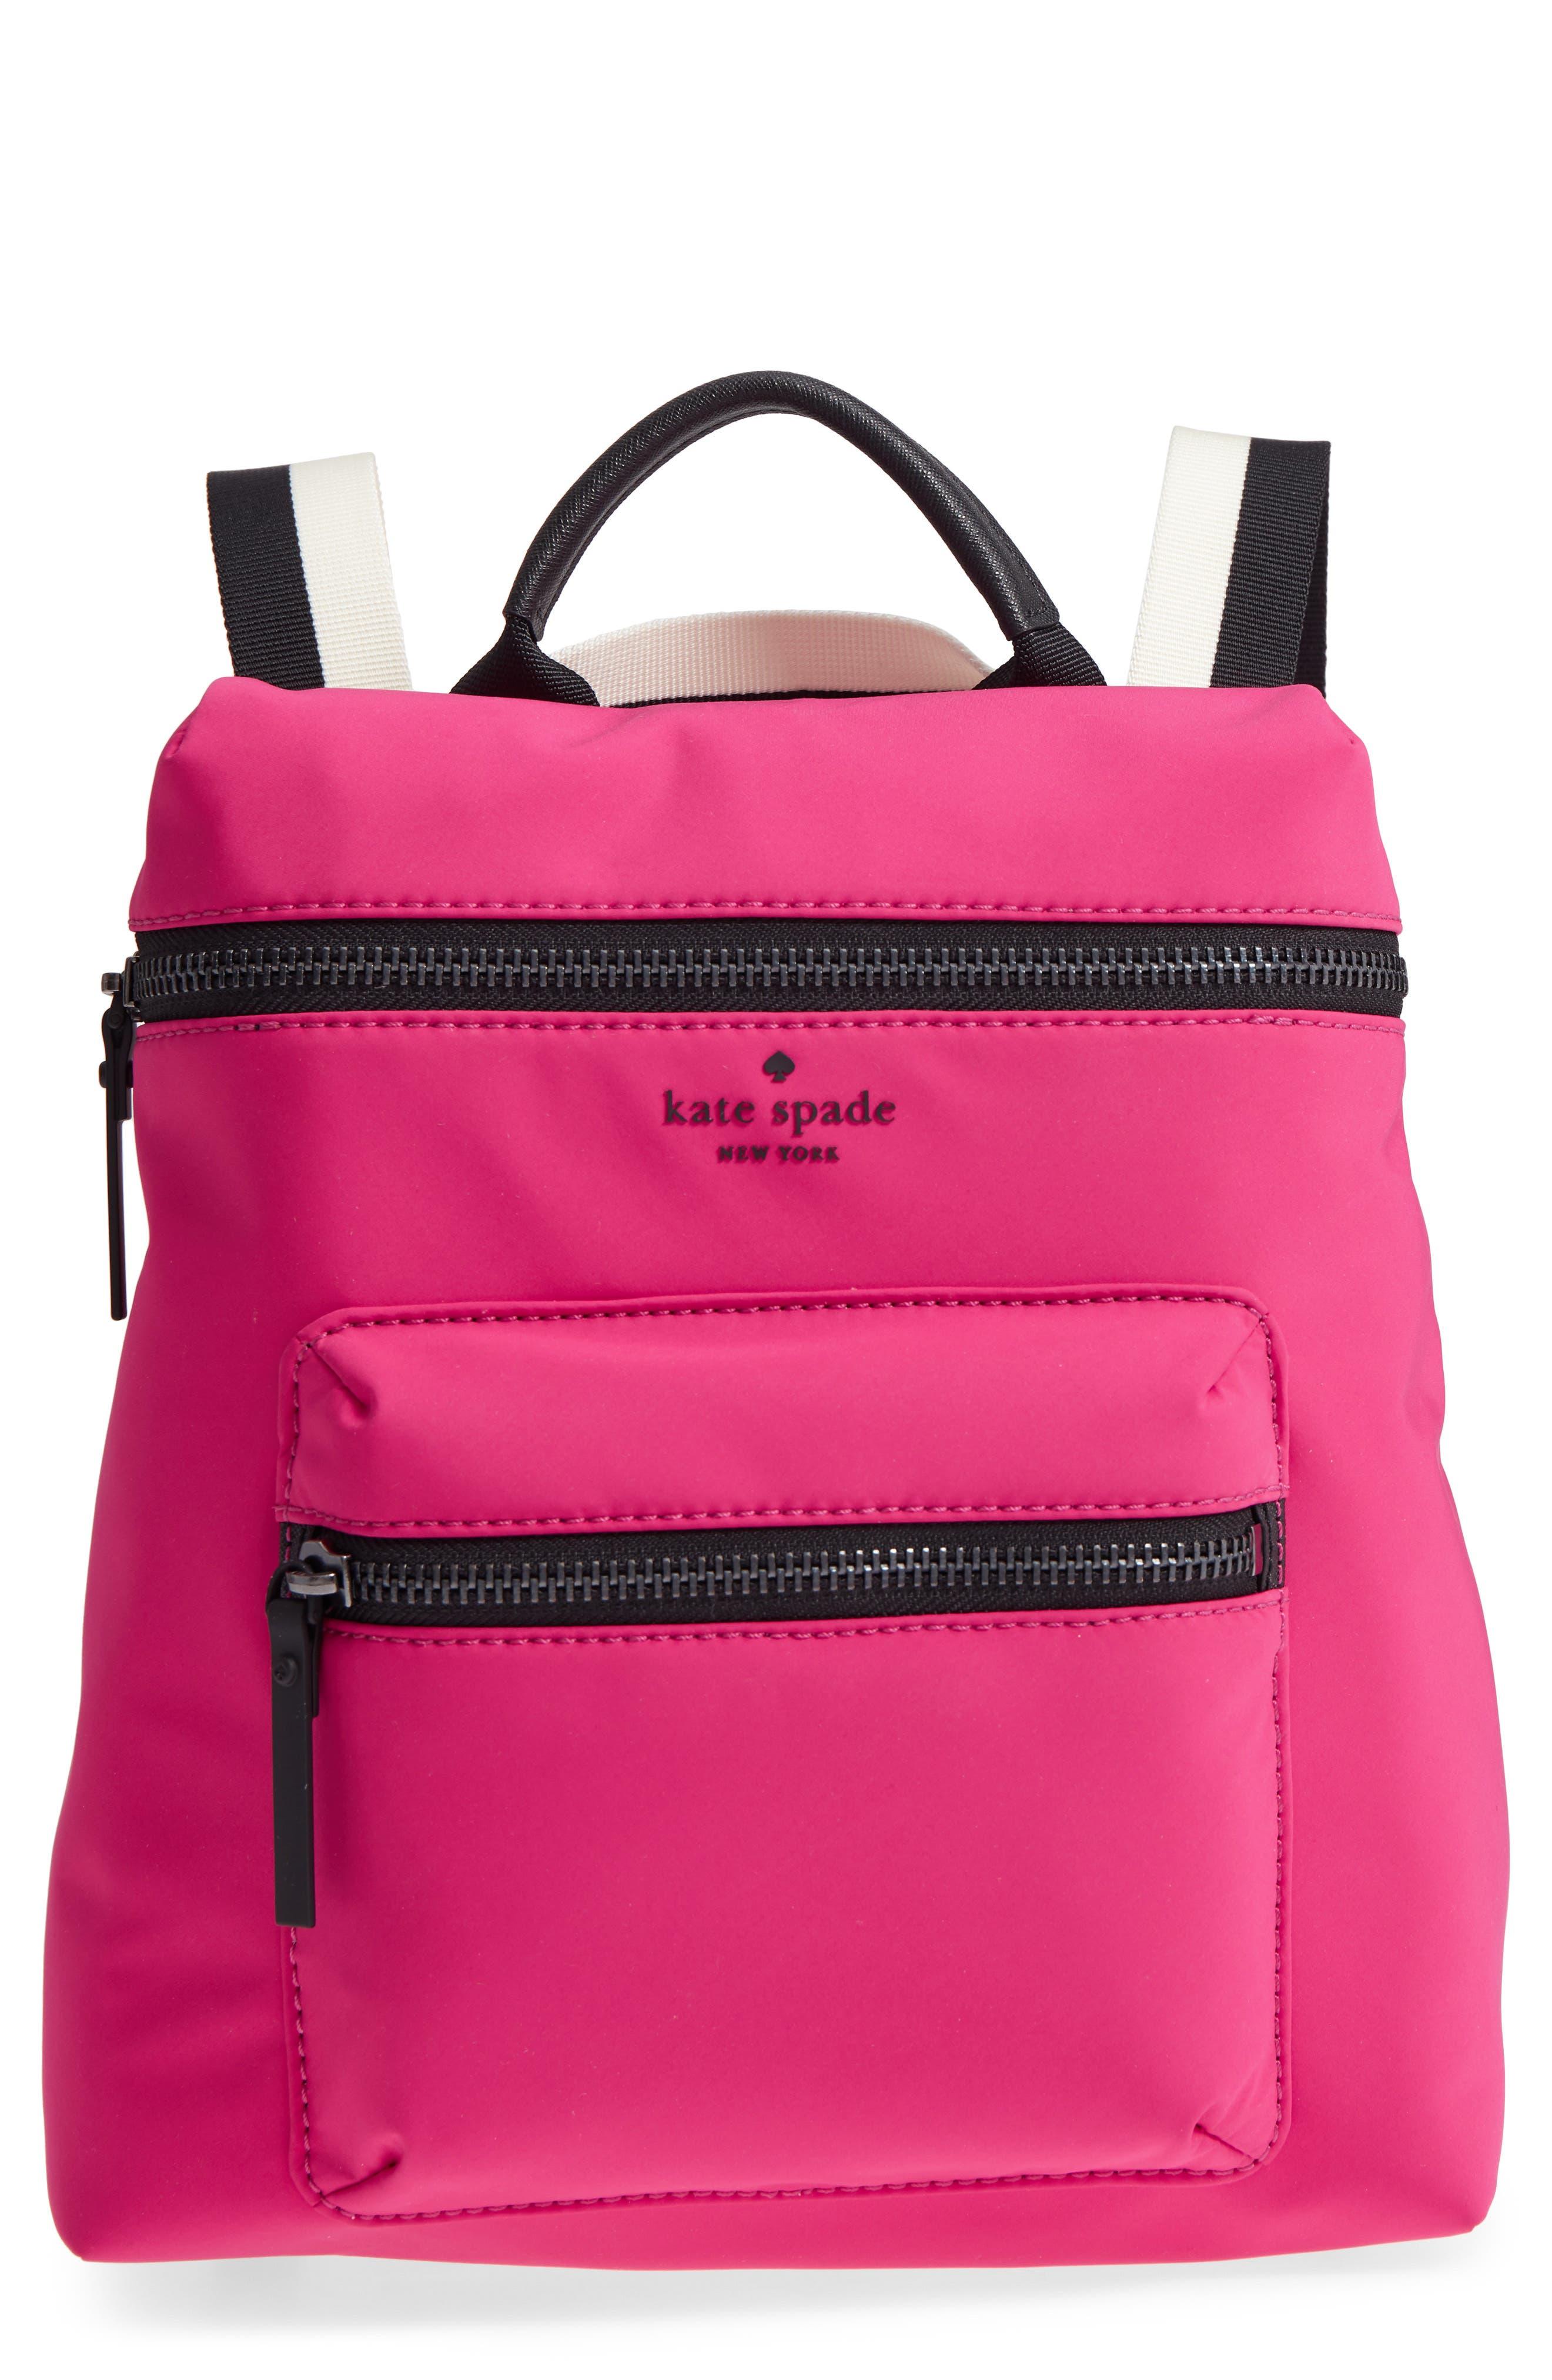 kate spade new york that's the spirit mini nylon convertible backpack